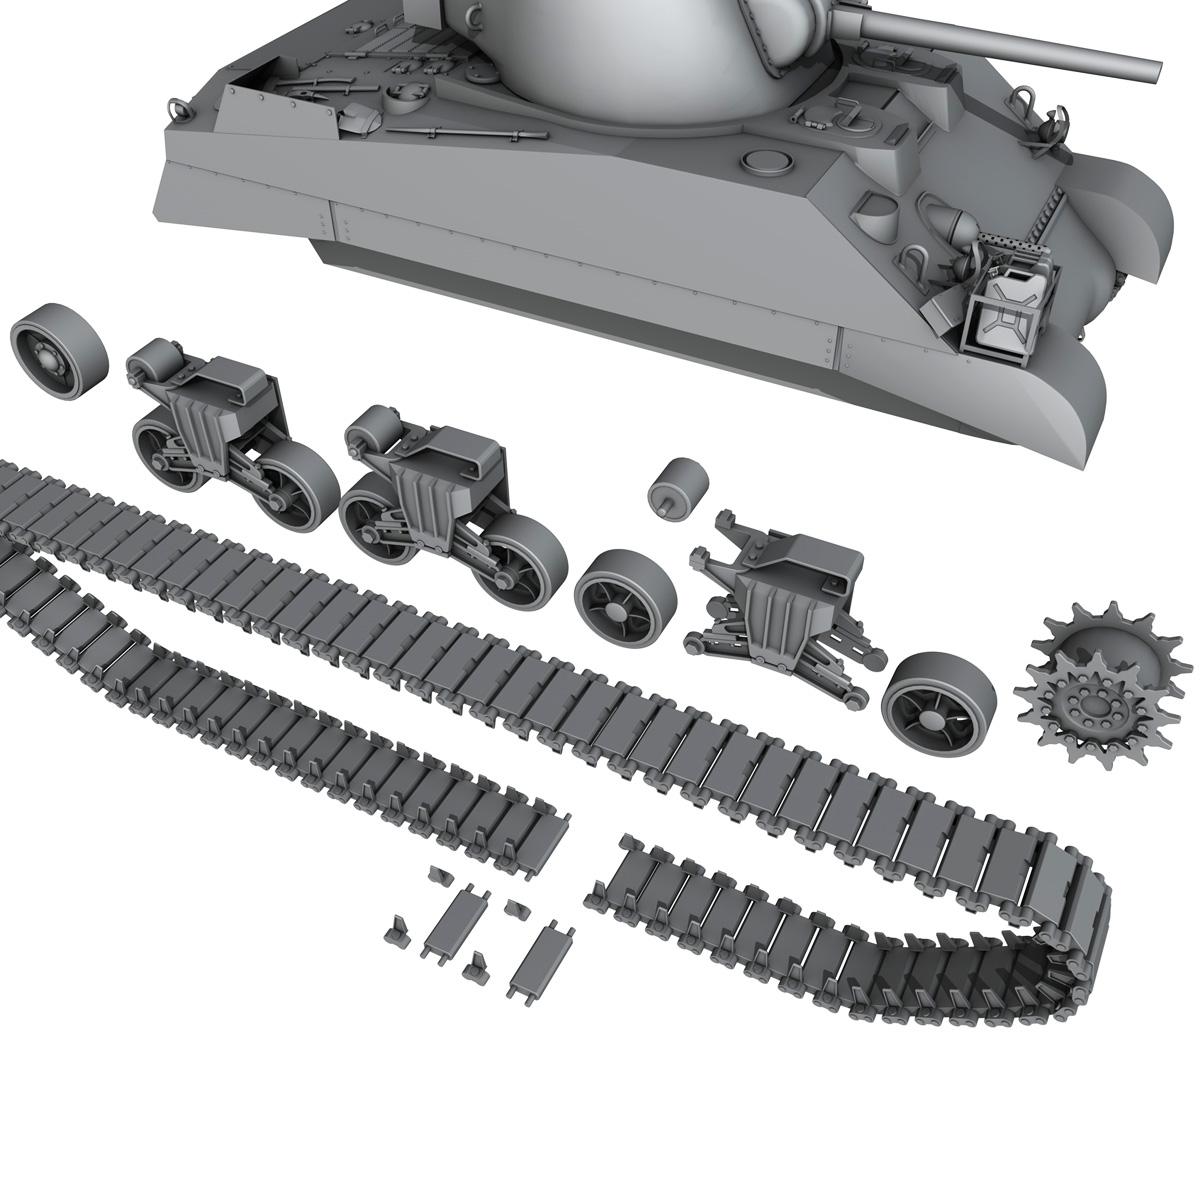 m4 sherman mk iii - britu armija 3d modelis 3ds fbx c4d lwo obj 201972